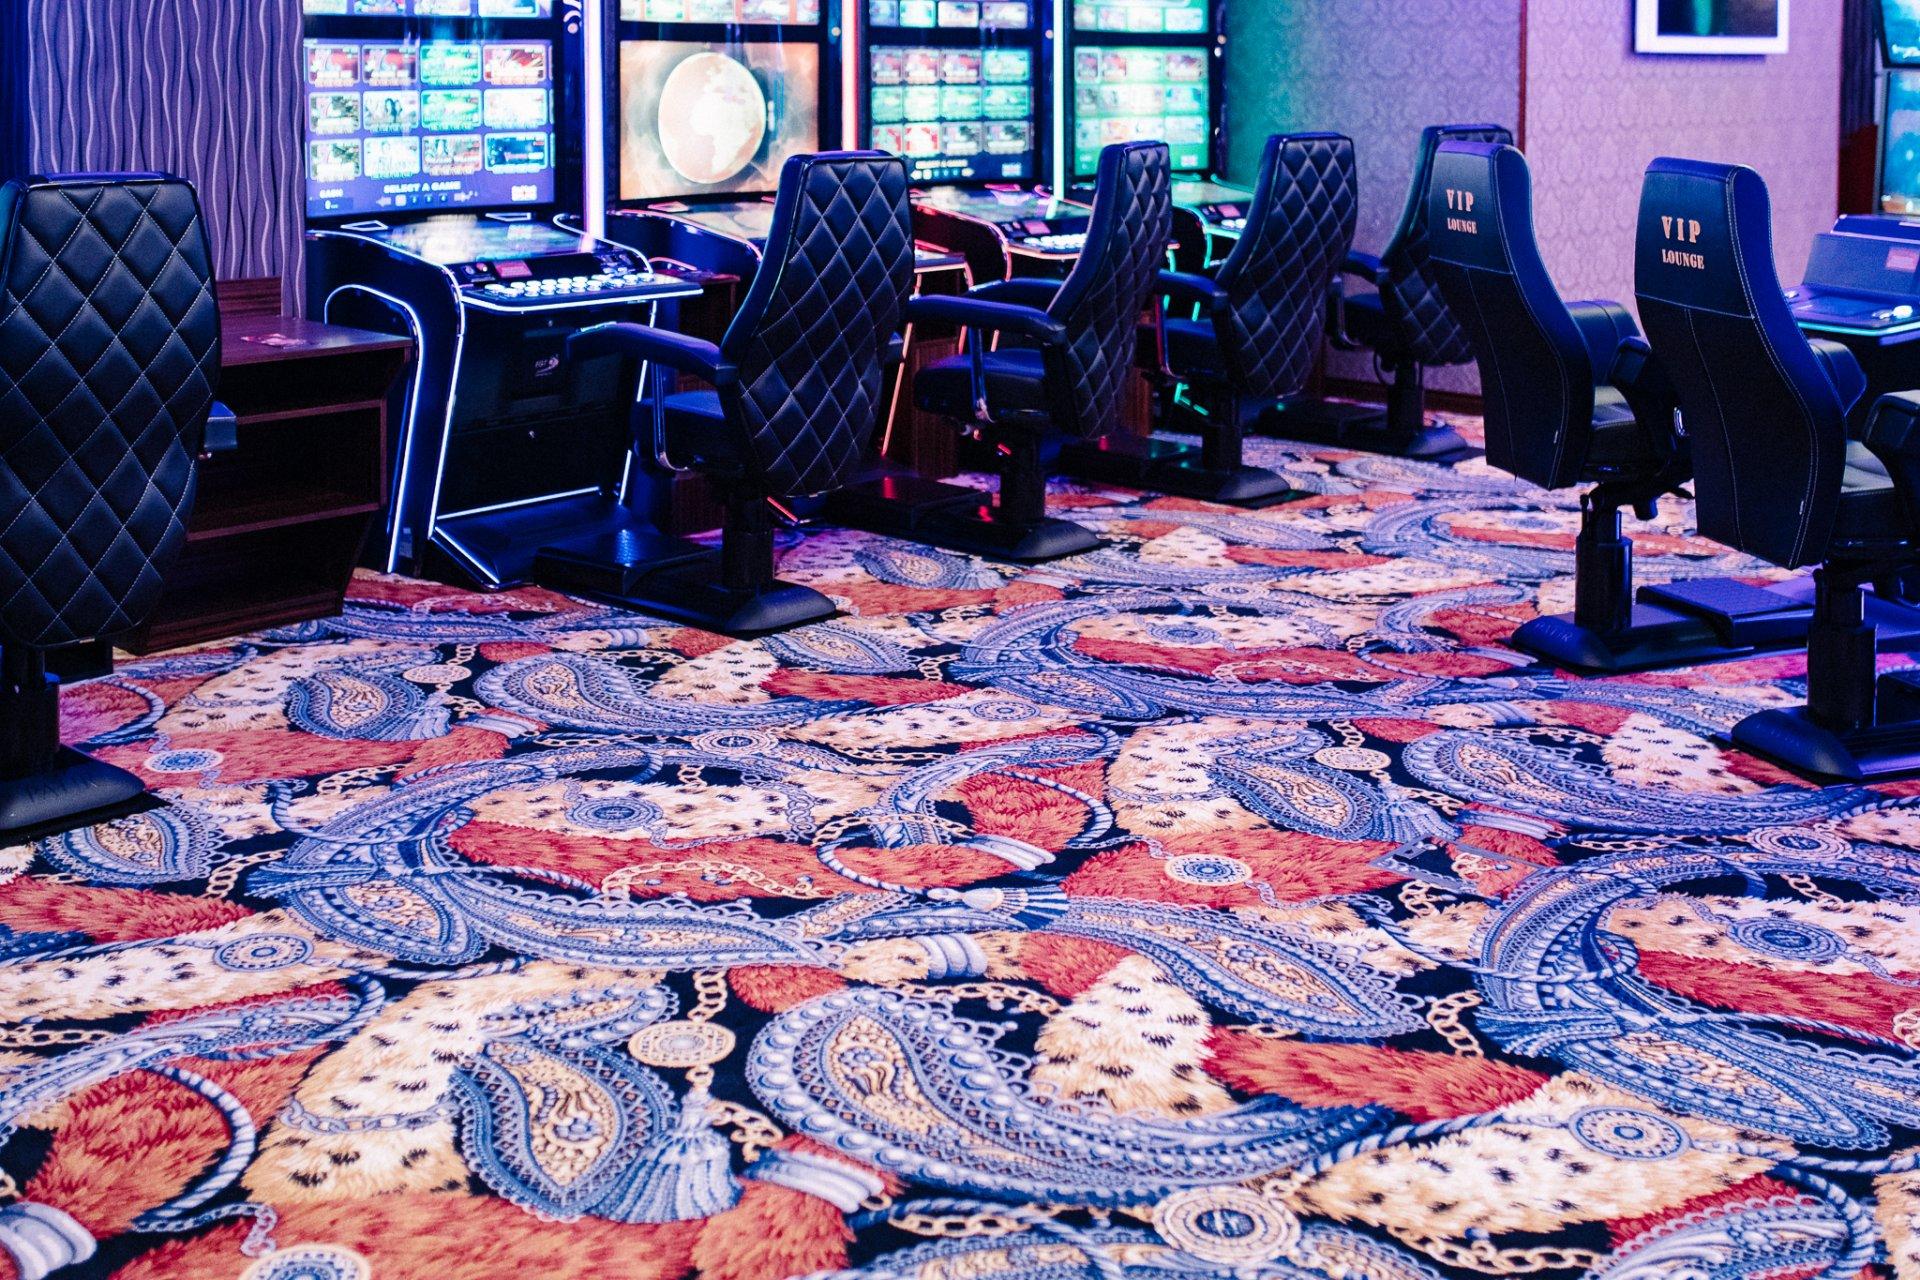 20200608-casino-veranda-copyright-vanillaroads-016